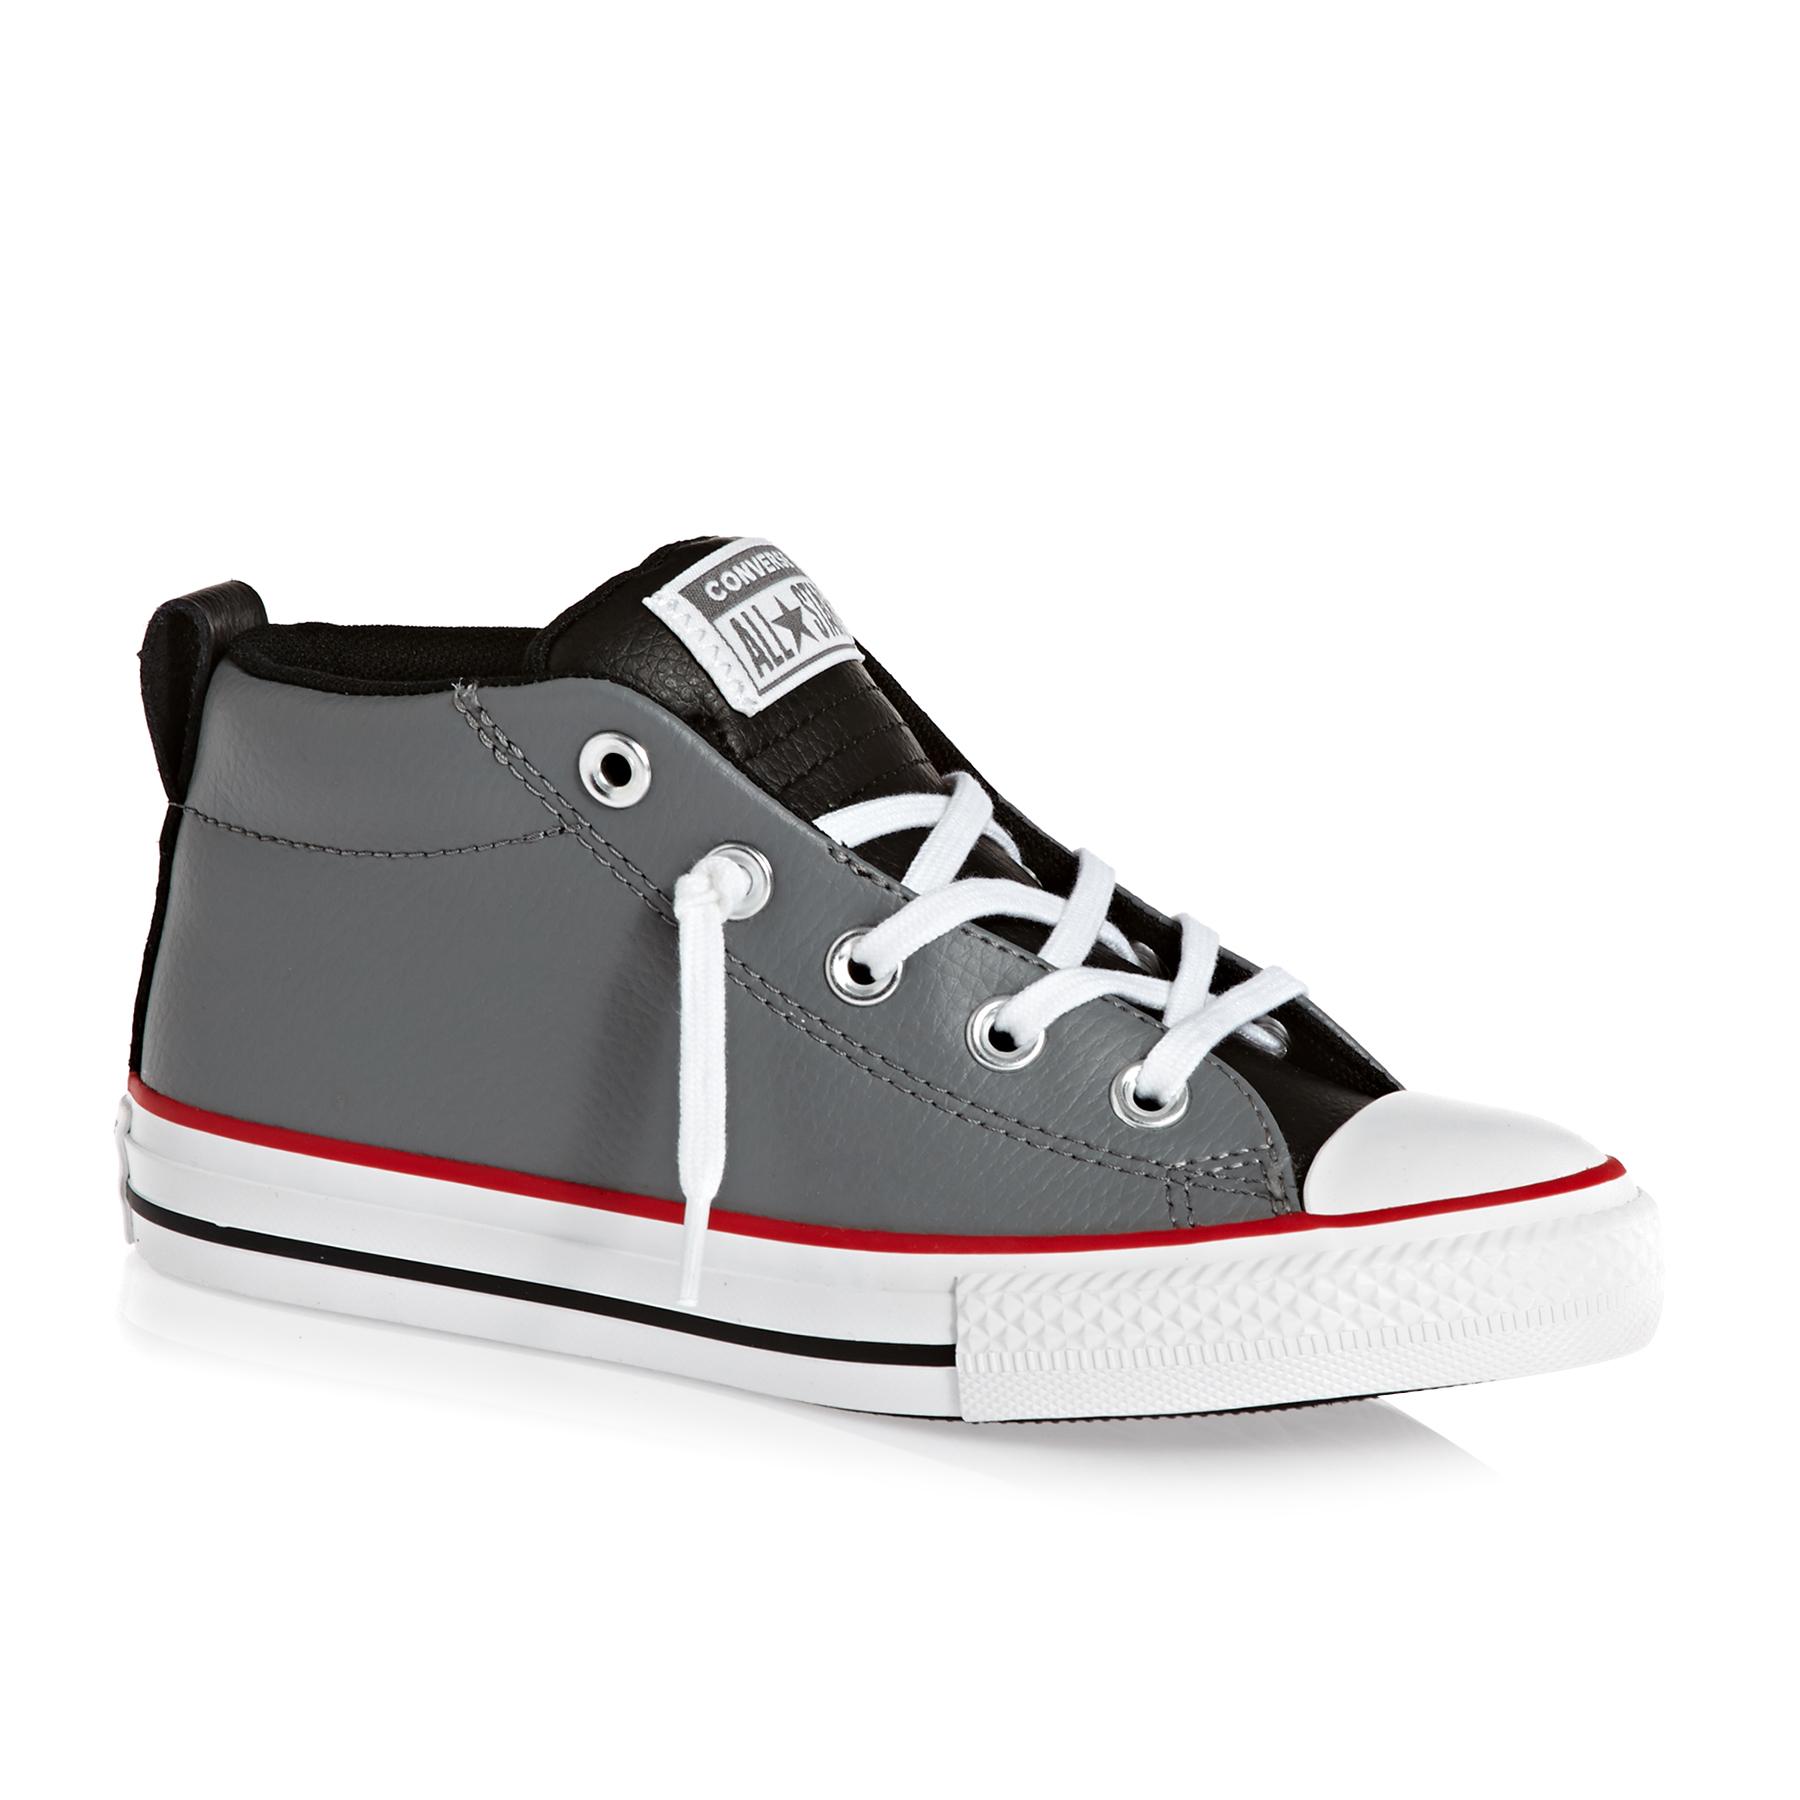 Calzado Niño Converse Chuck Taylor All Star Leather Street